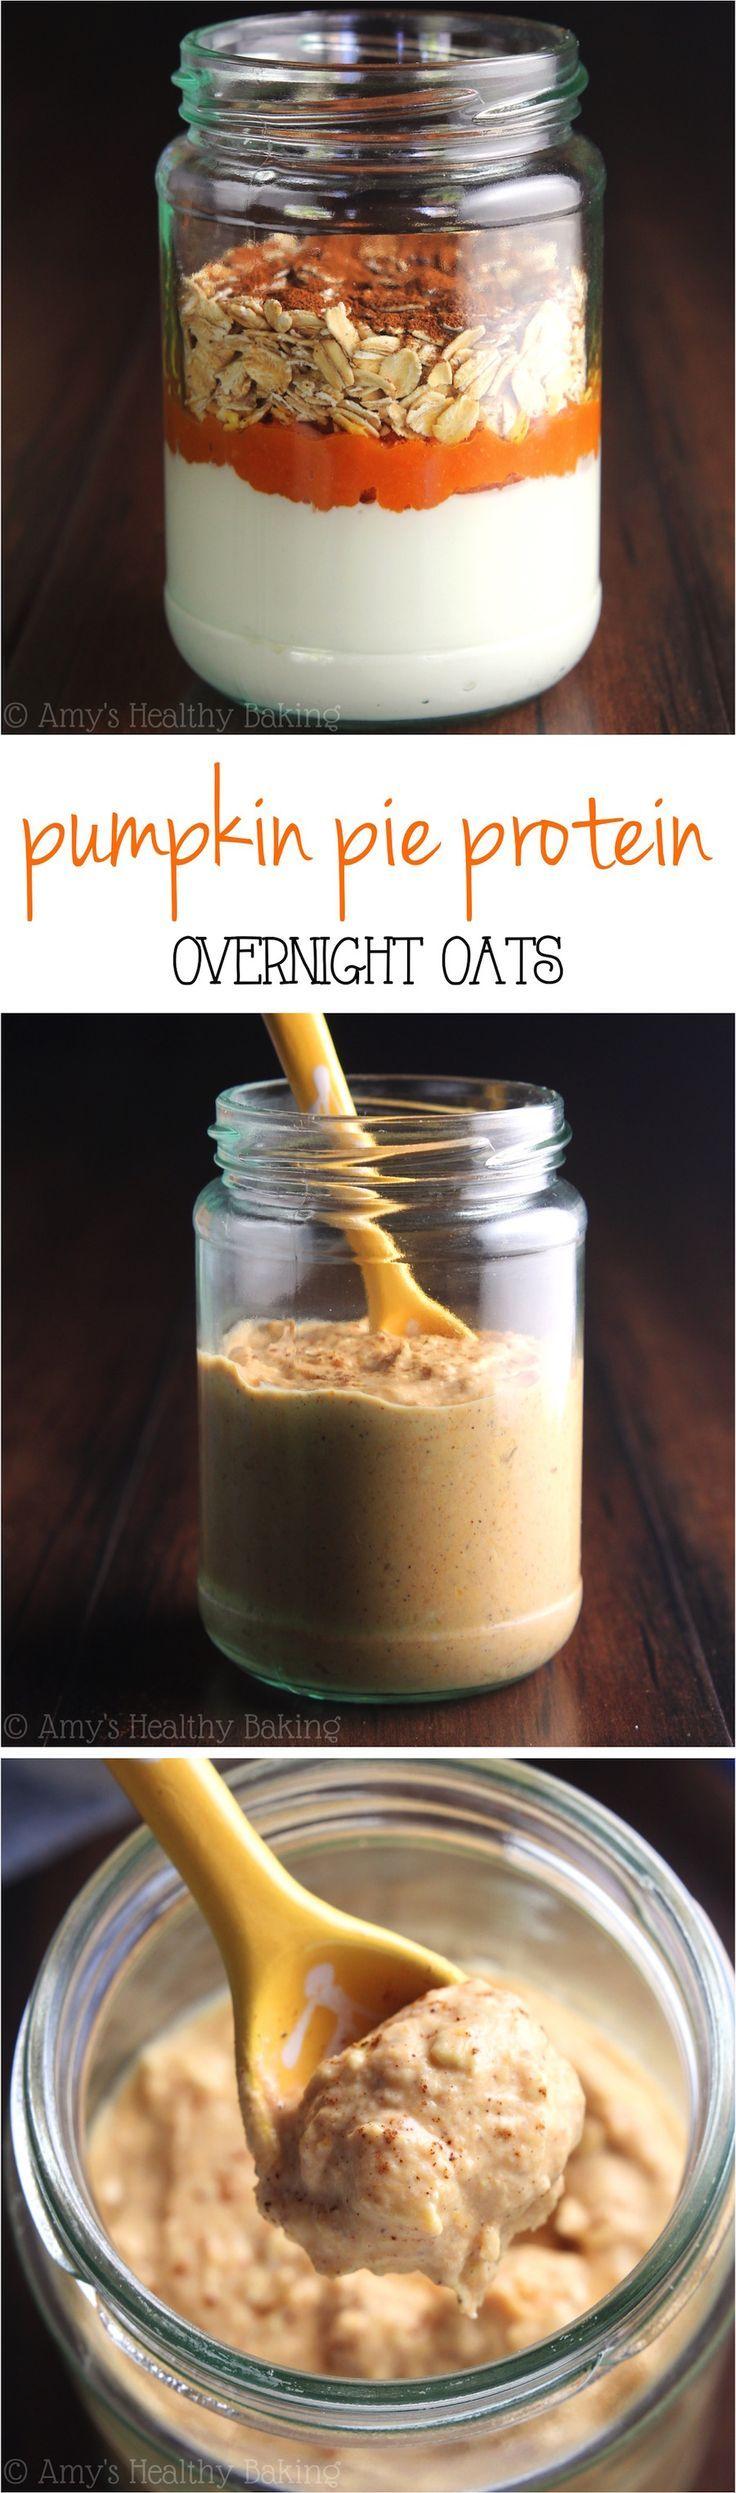 Pumpkin Pie Protein Overnight Oats